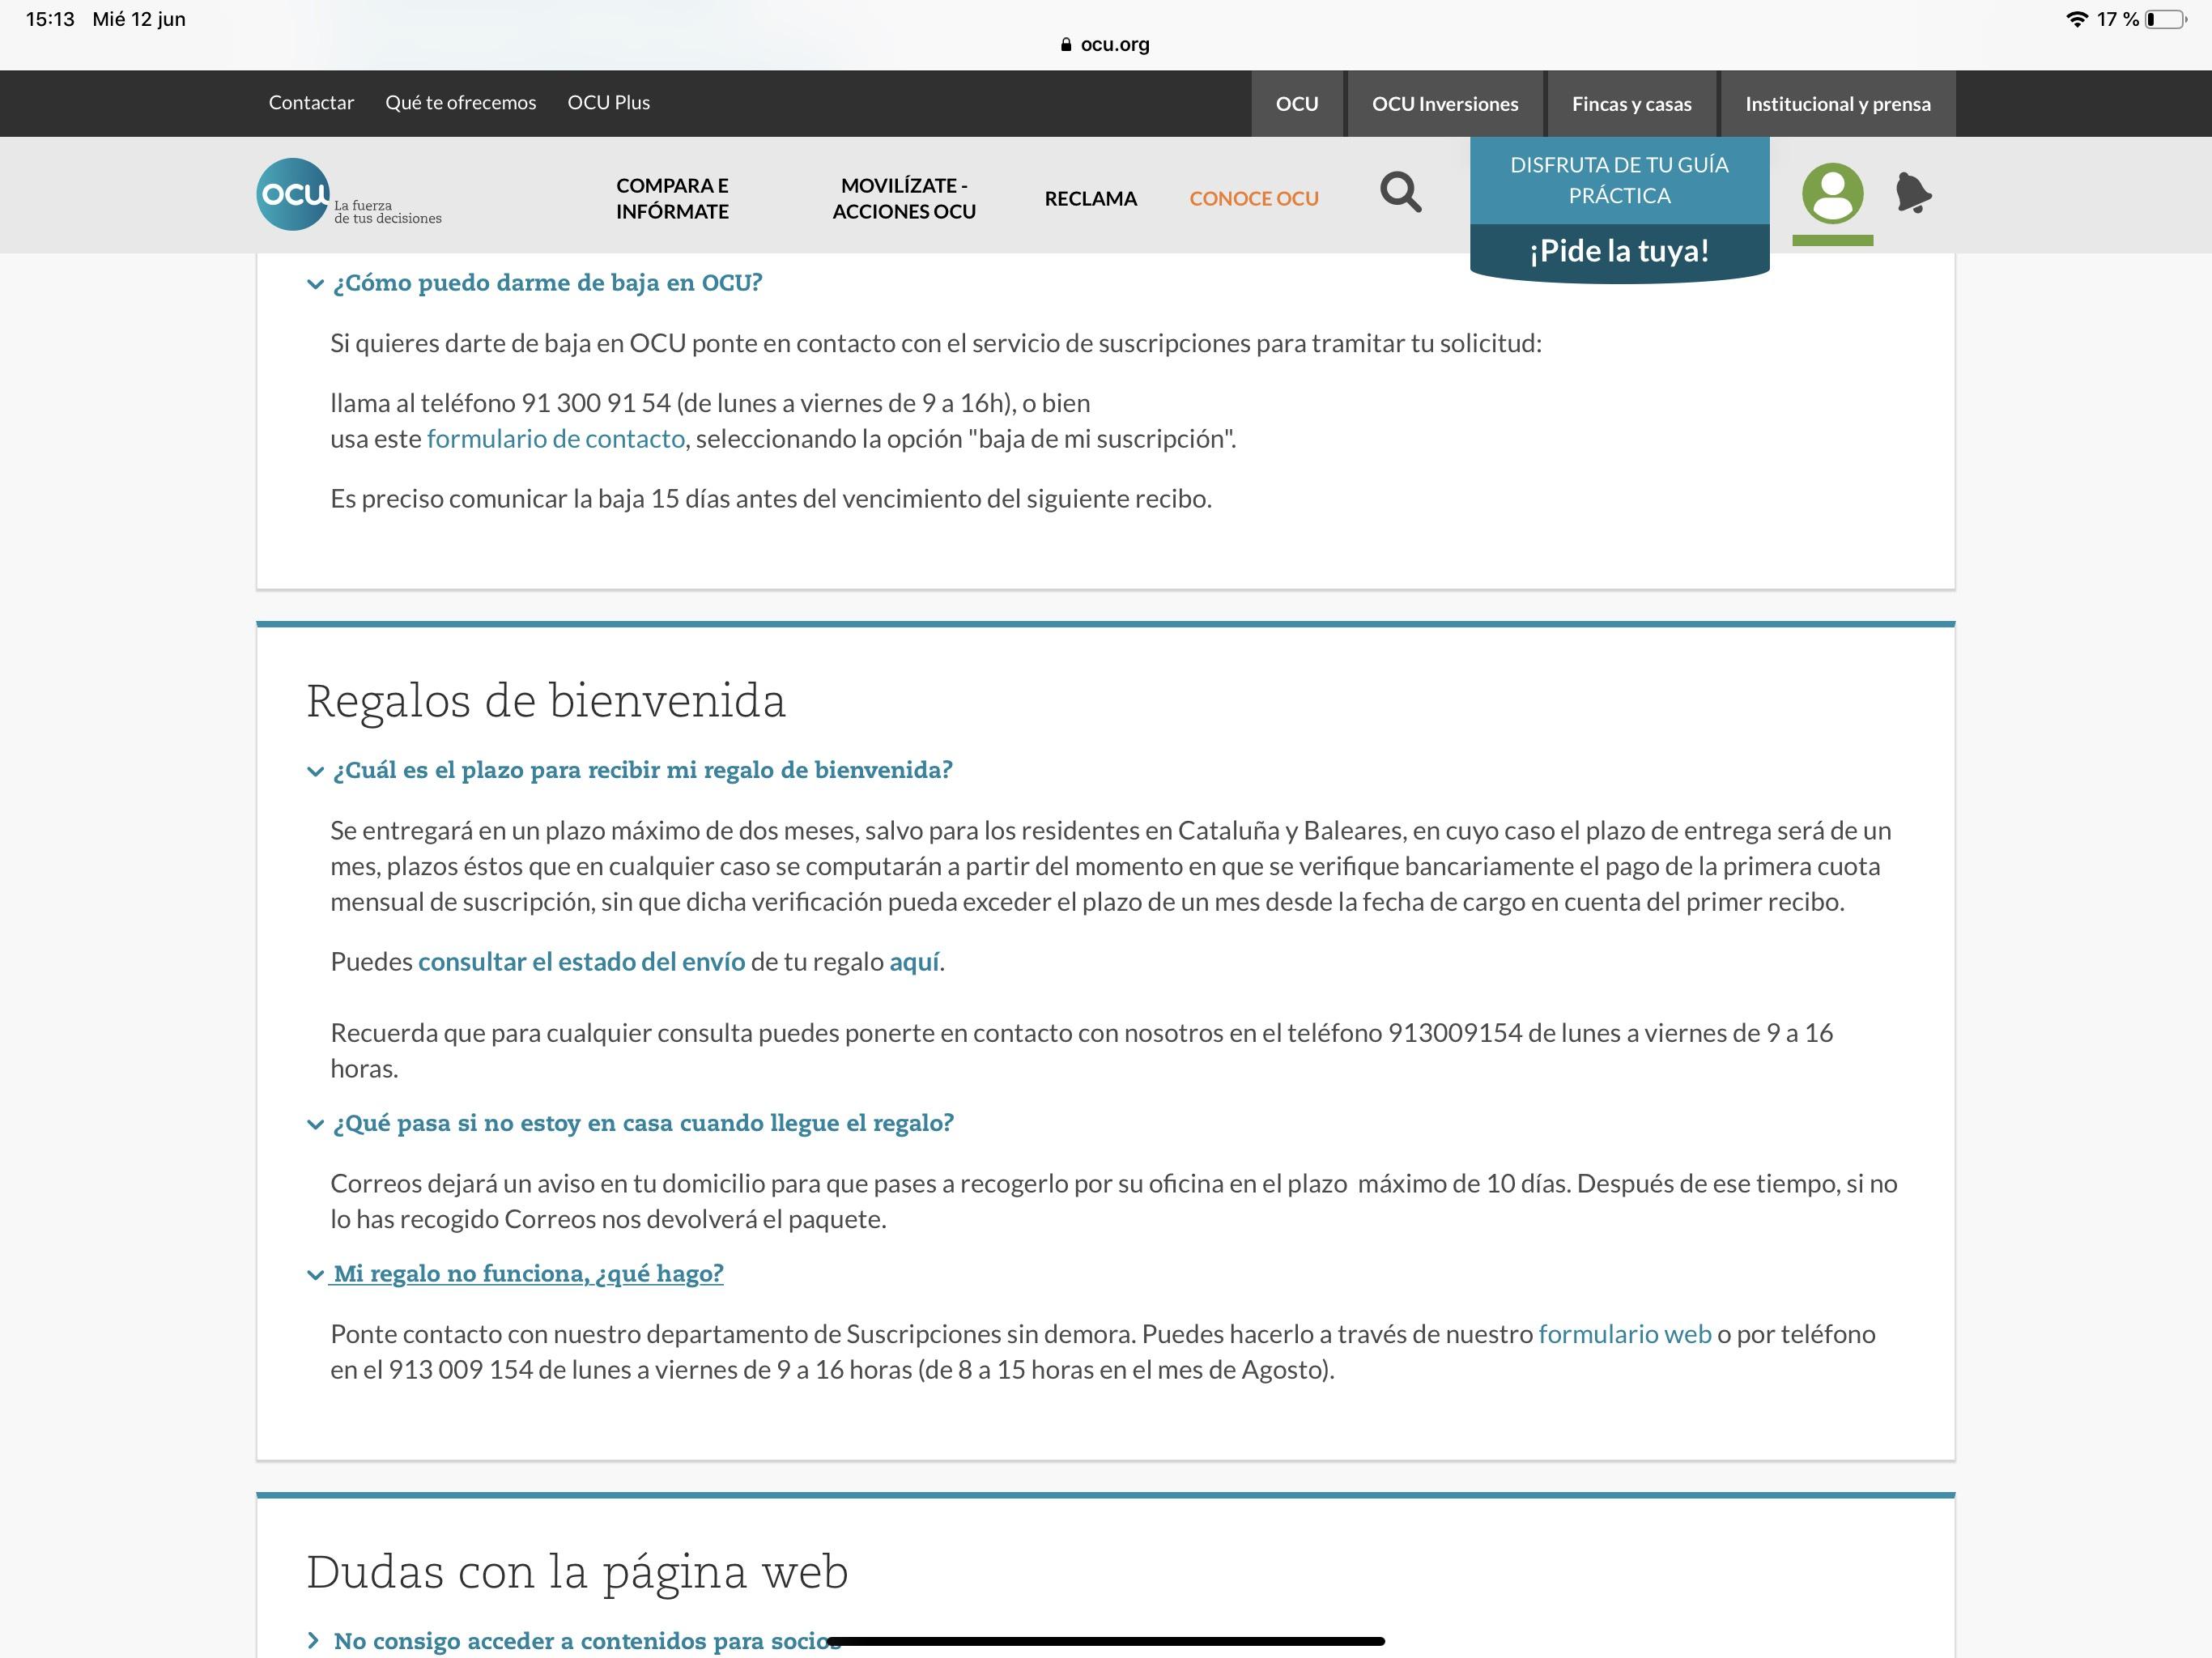 c849d8c2d Cheque Amazon de 30€ Gratis al suscribirte a la OCU - chollometro.com